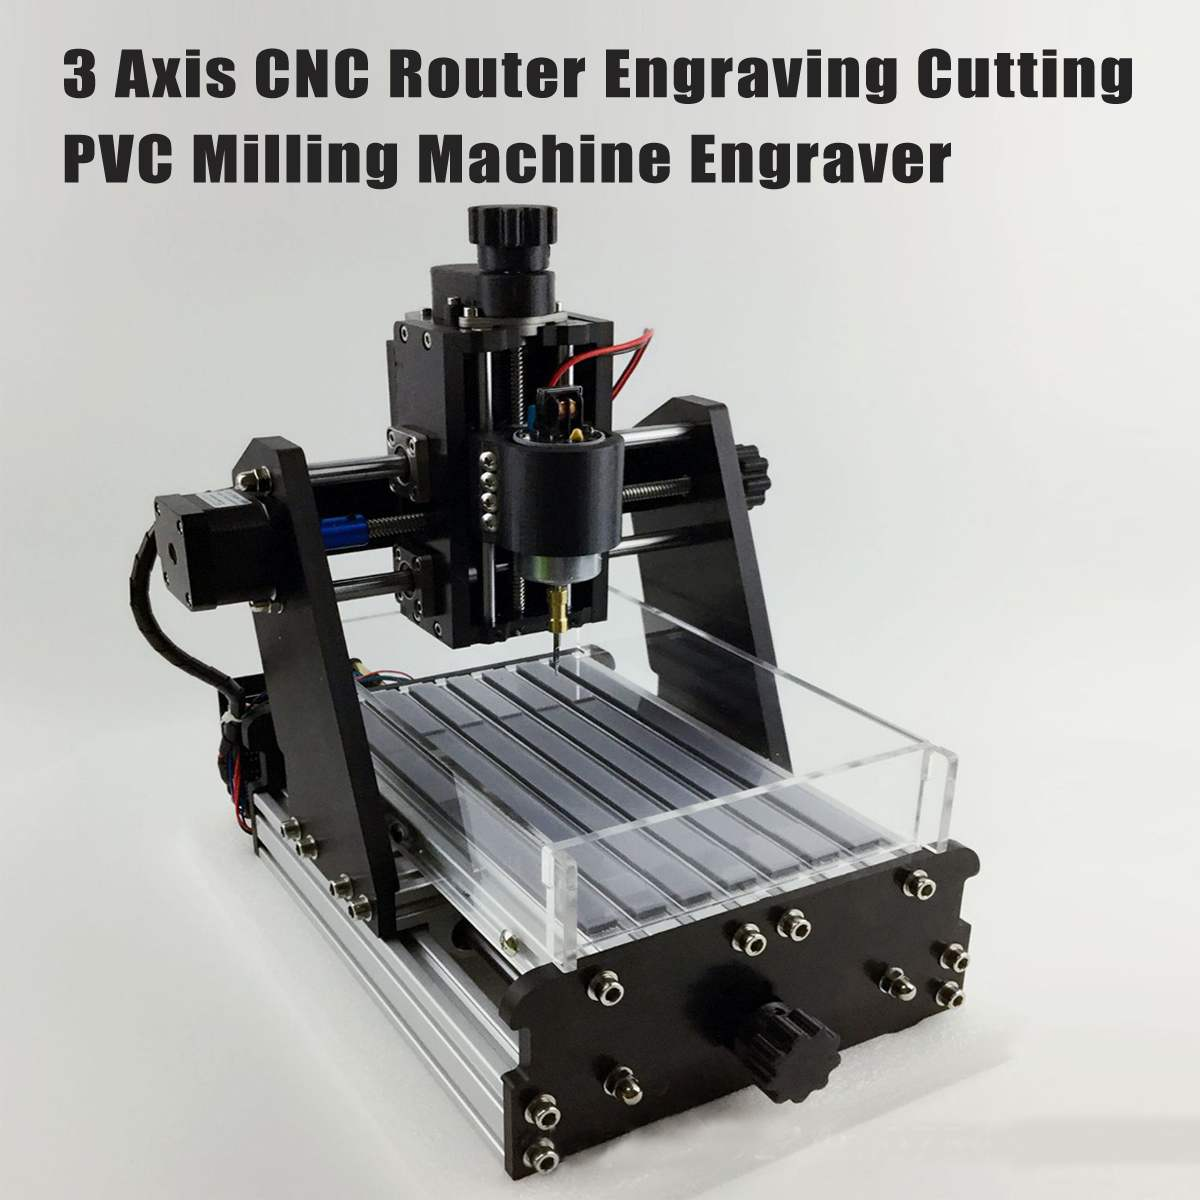 3 Axises CNC Router DIY Mini Engraving Machine Engraving Cutting PVC Milling Machine Engraver No Laser 100V-240V Wood Router